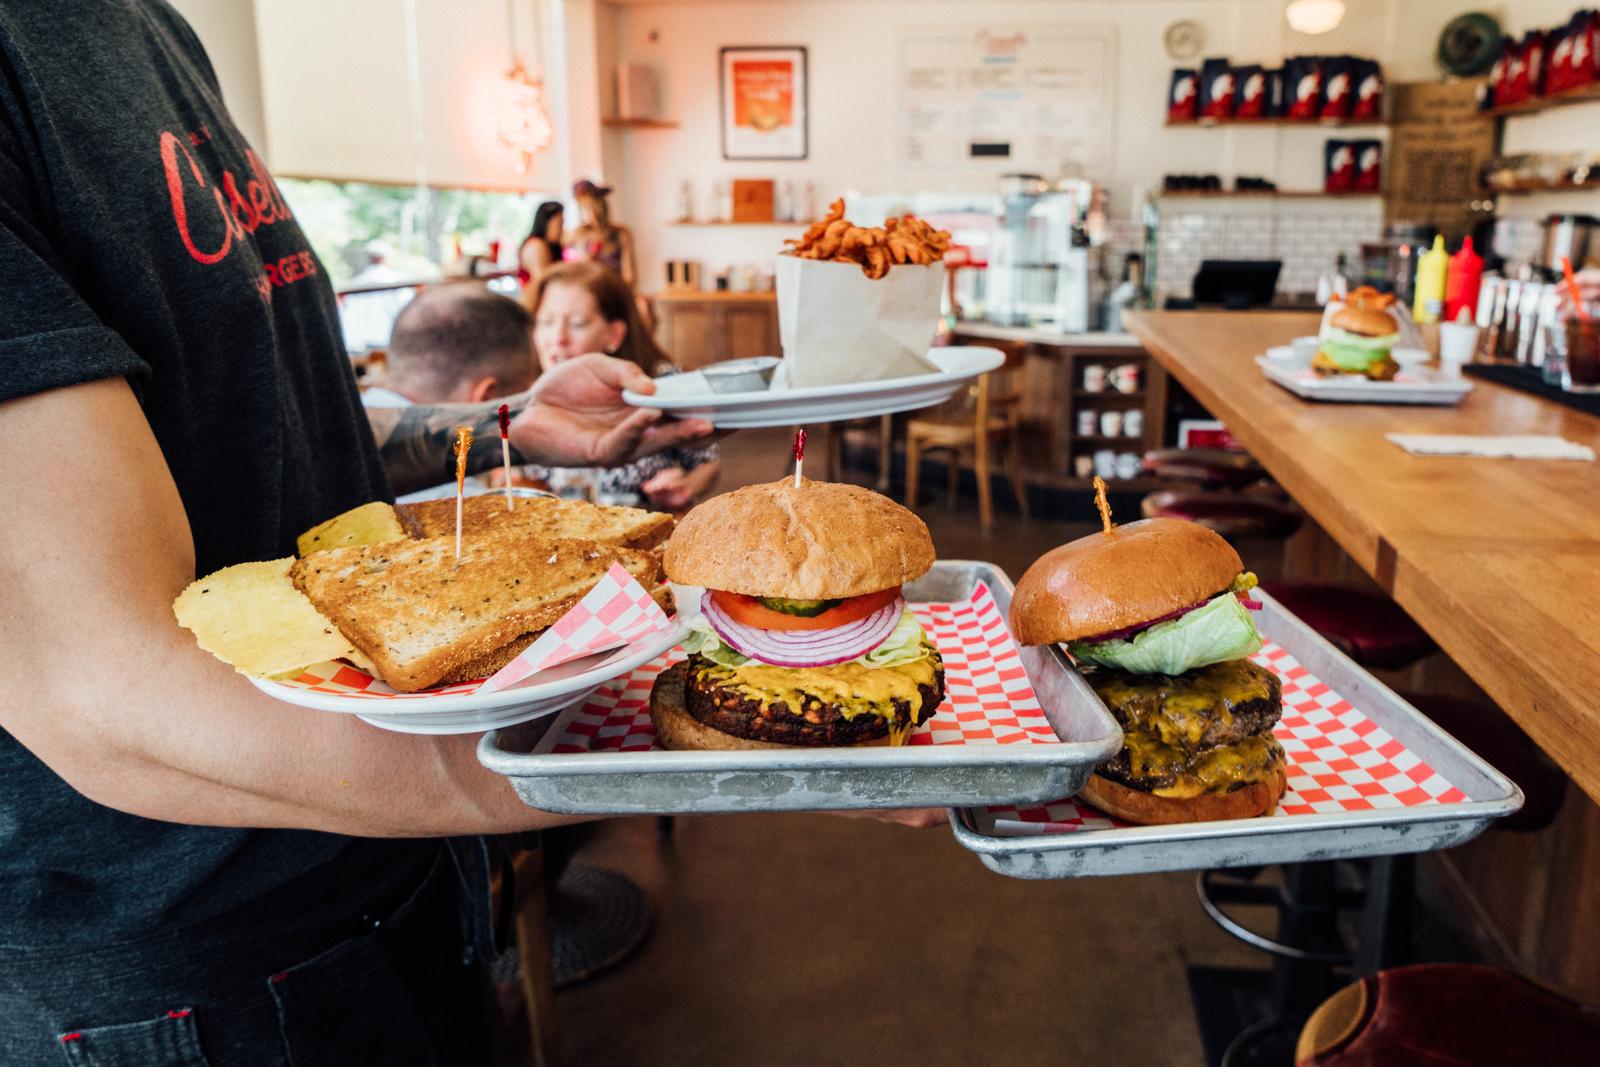 Patty Melt, Vegan Burger, Double 1/3lb Cheeseburger, Sweet Potato Fries